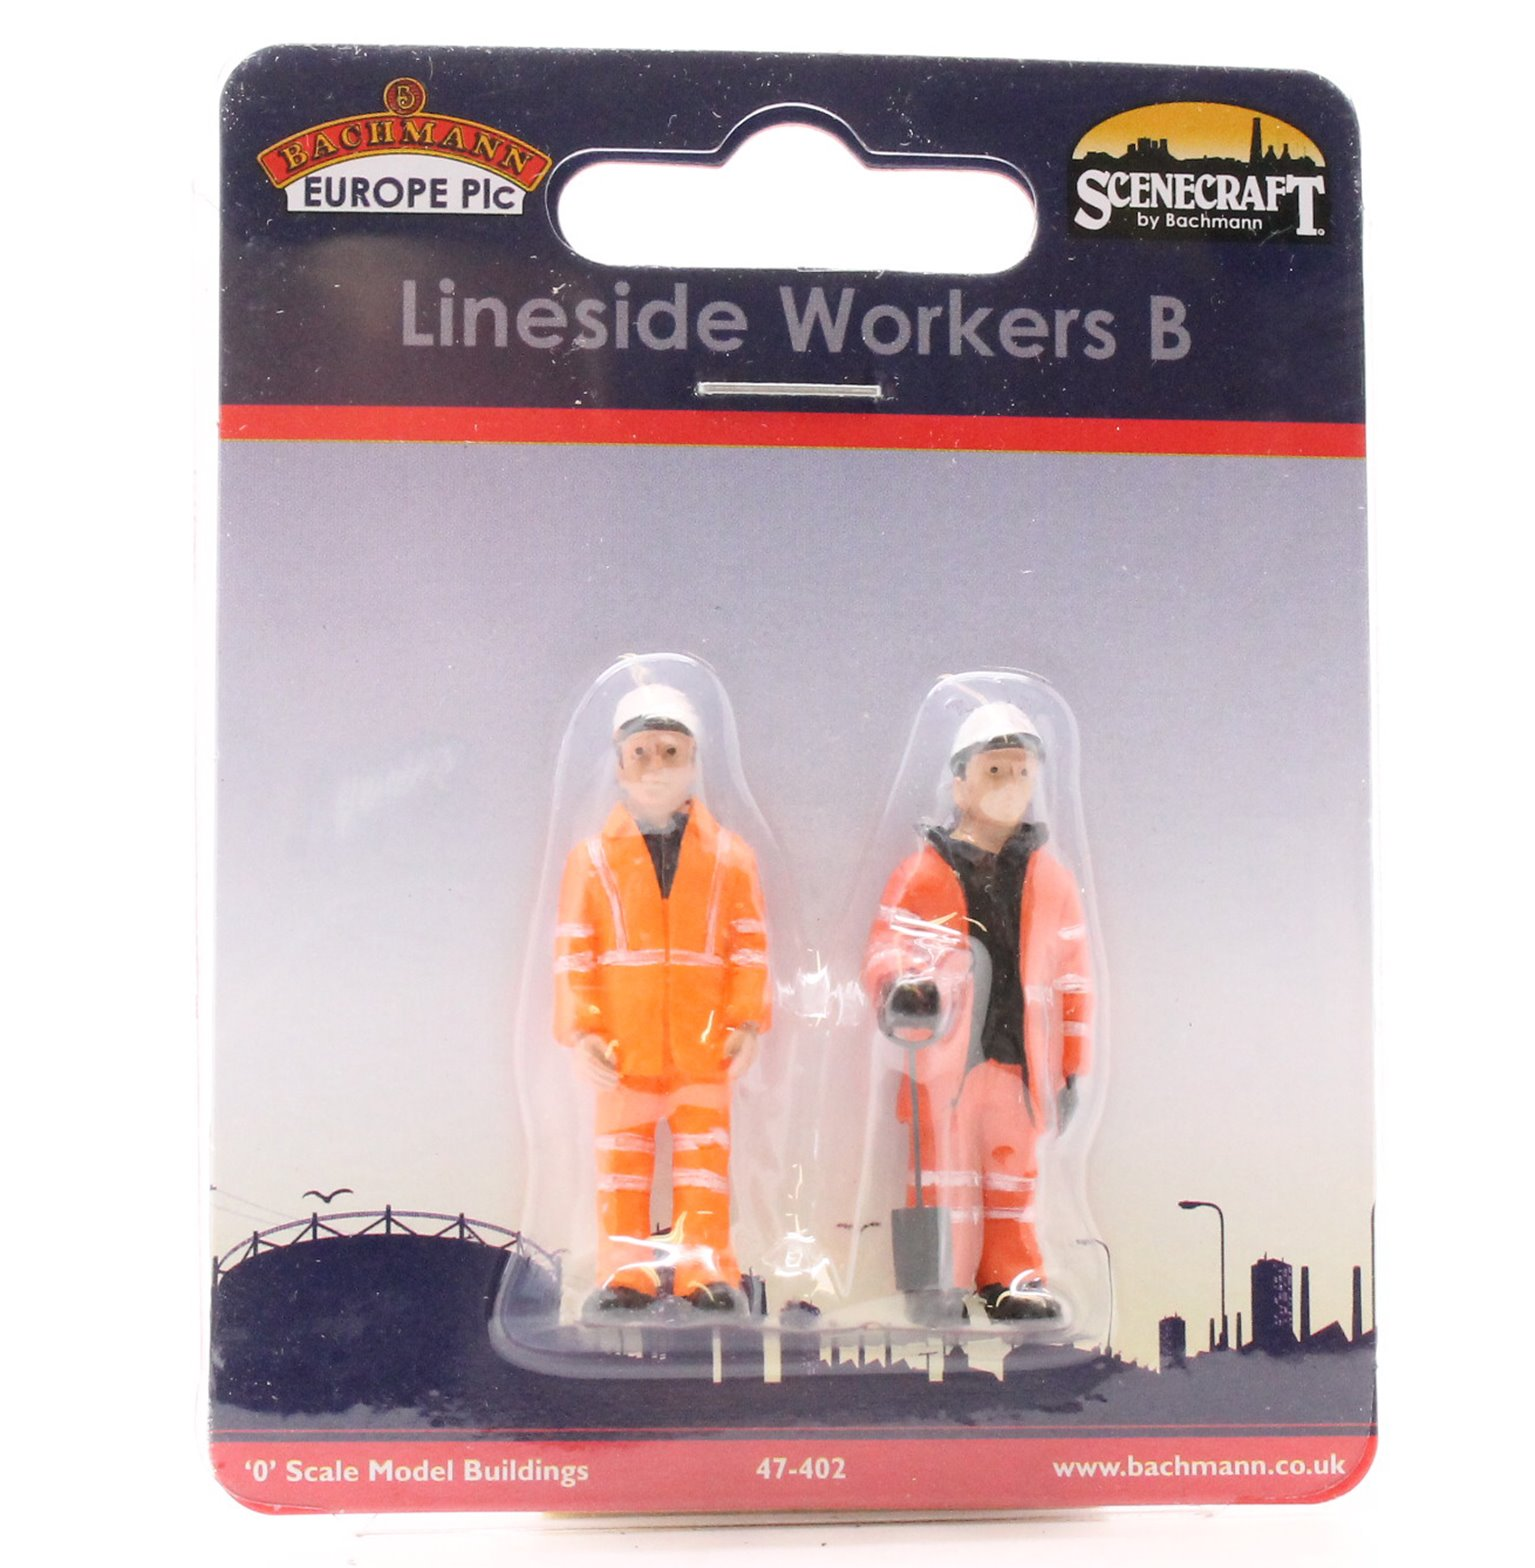 Lineside Workers B